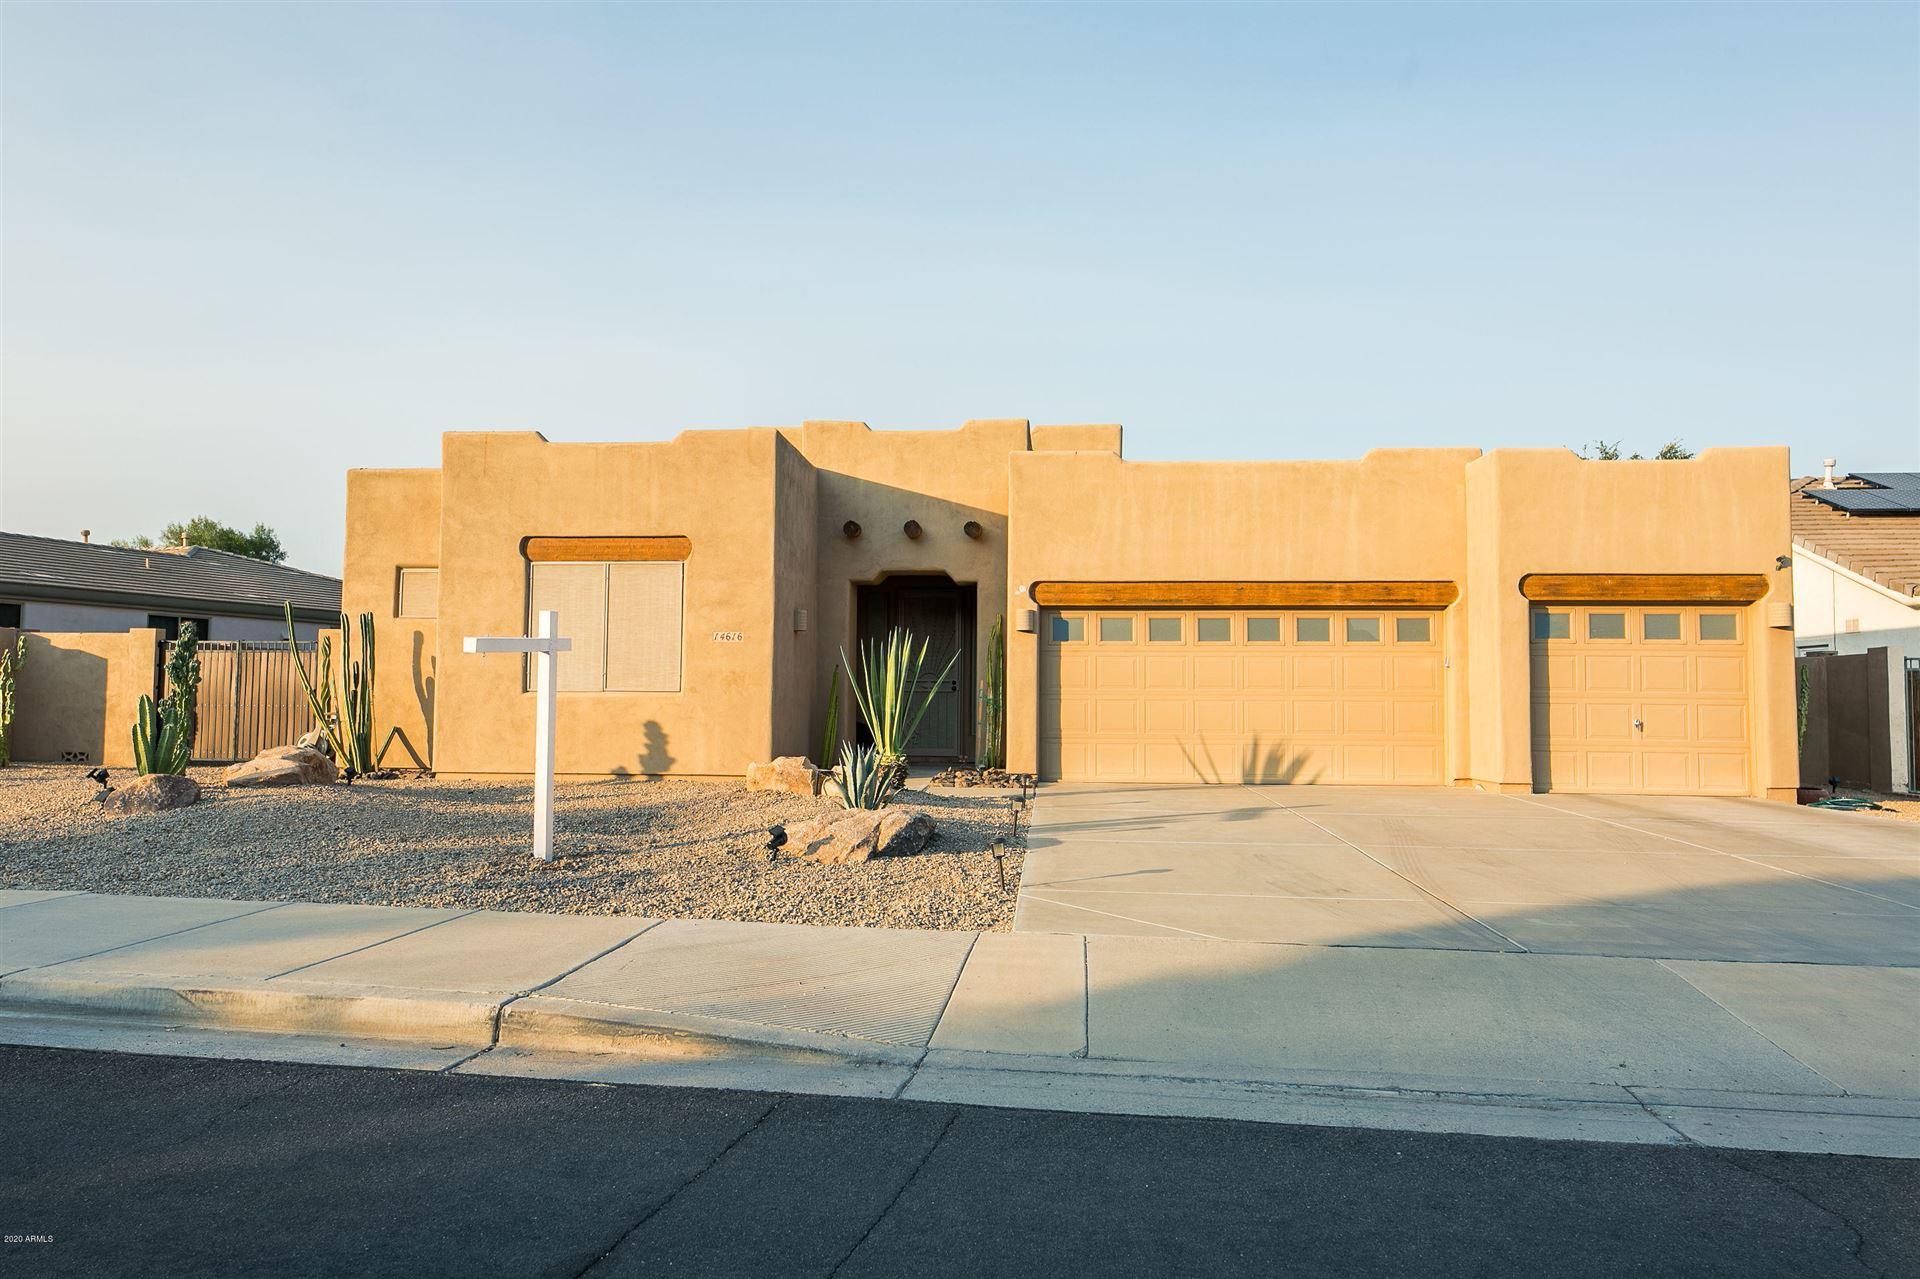 14616 W CLARENDON Avenue, Goodyear, AZ 85395 - MLS#: 6128028